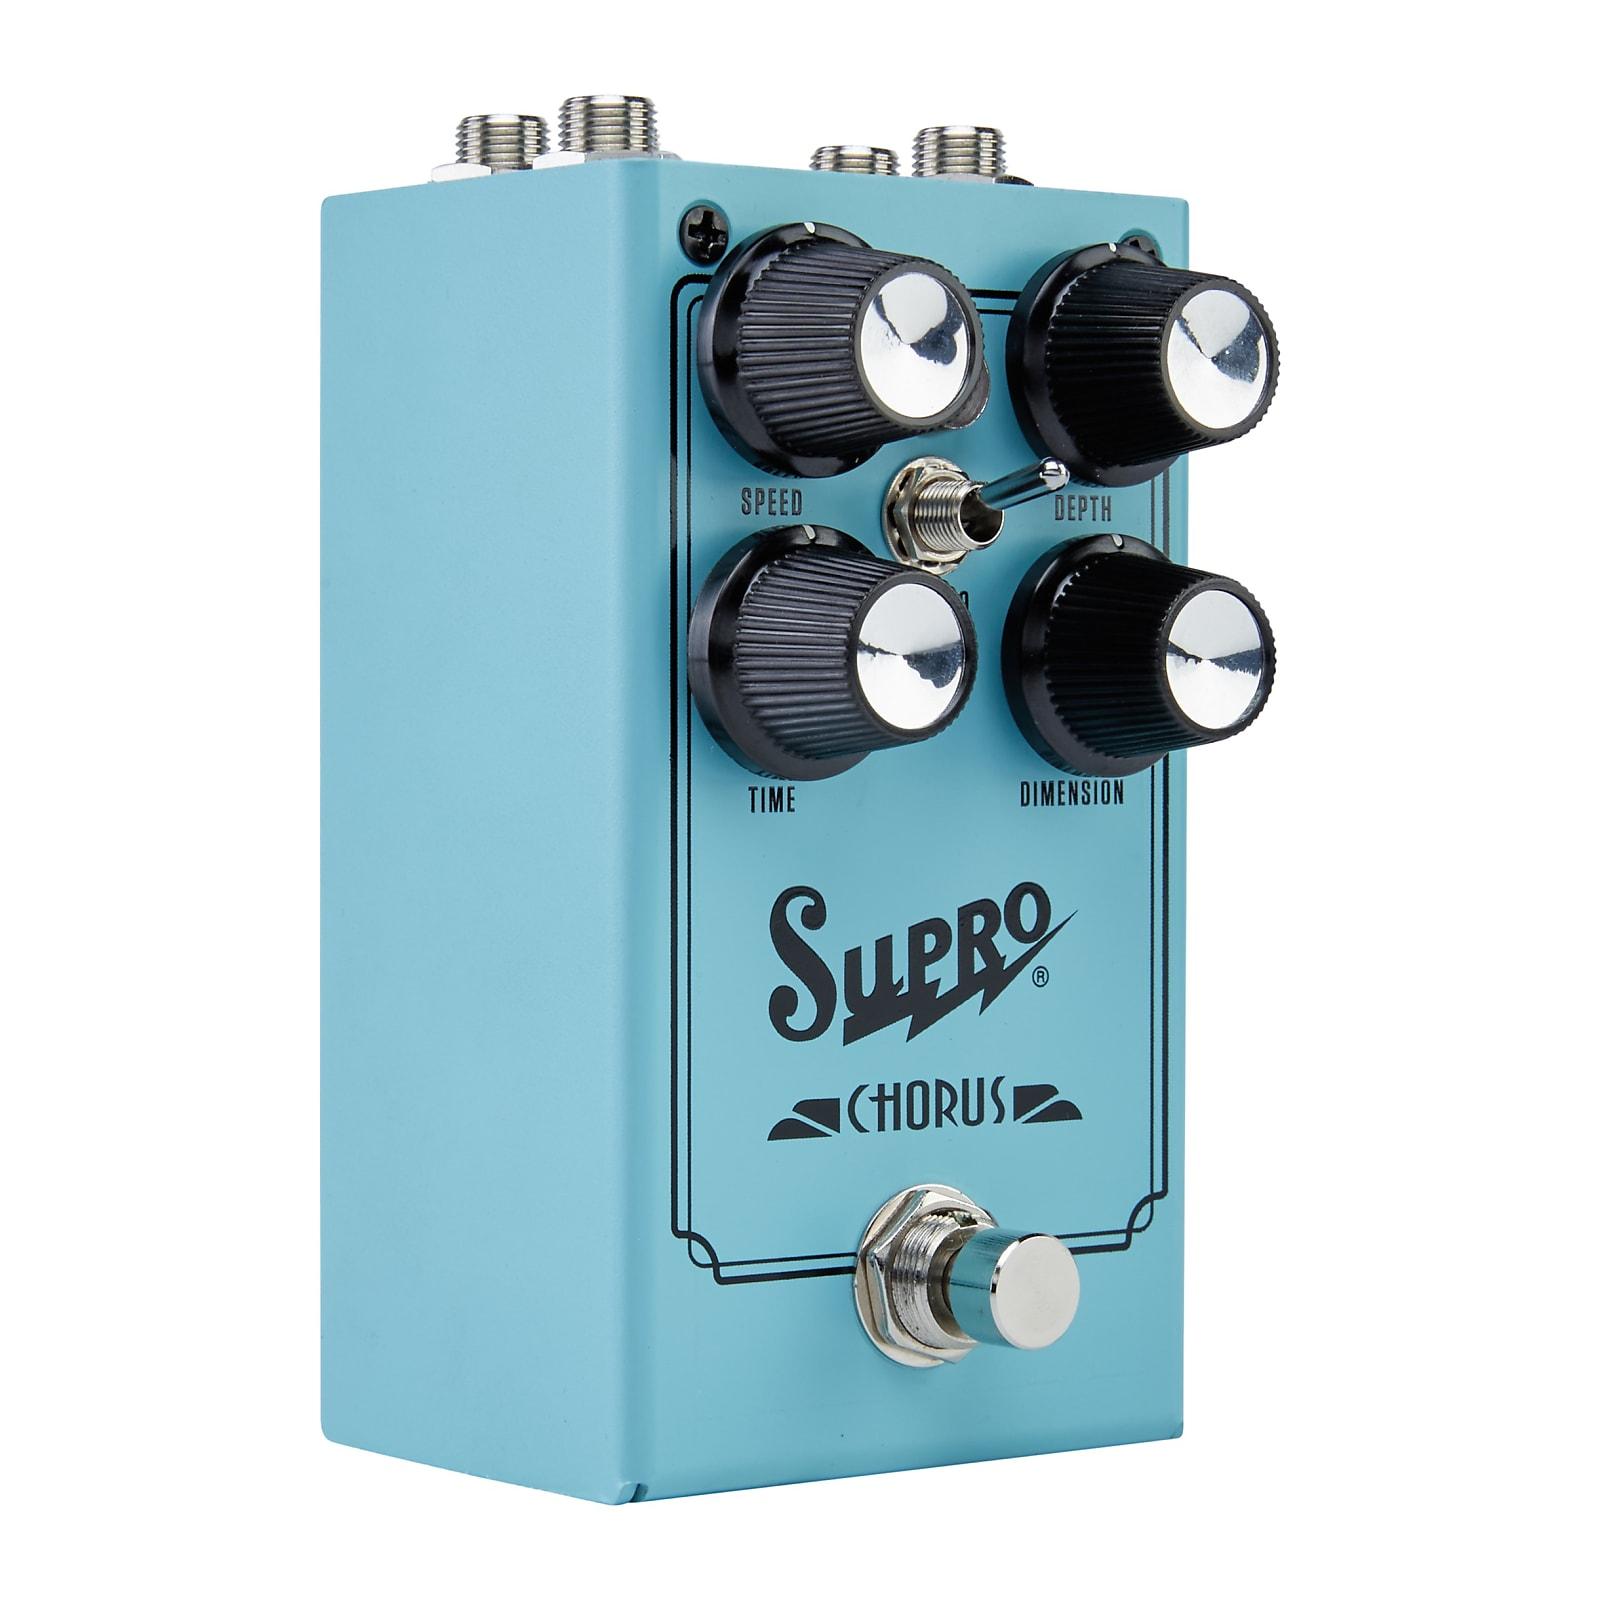 Supro 1307 Analog Chorus Effects Pedal